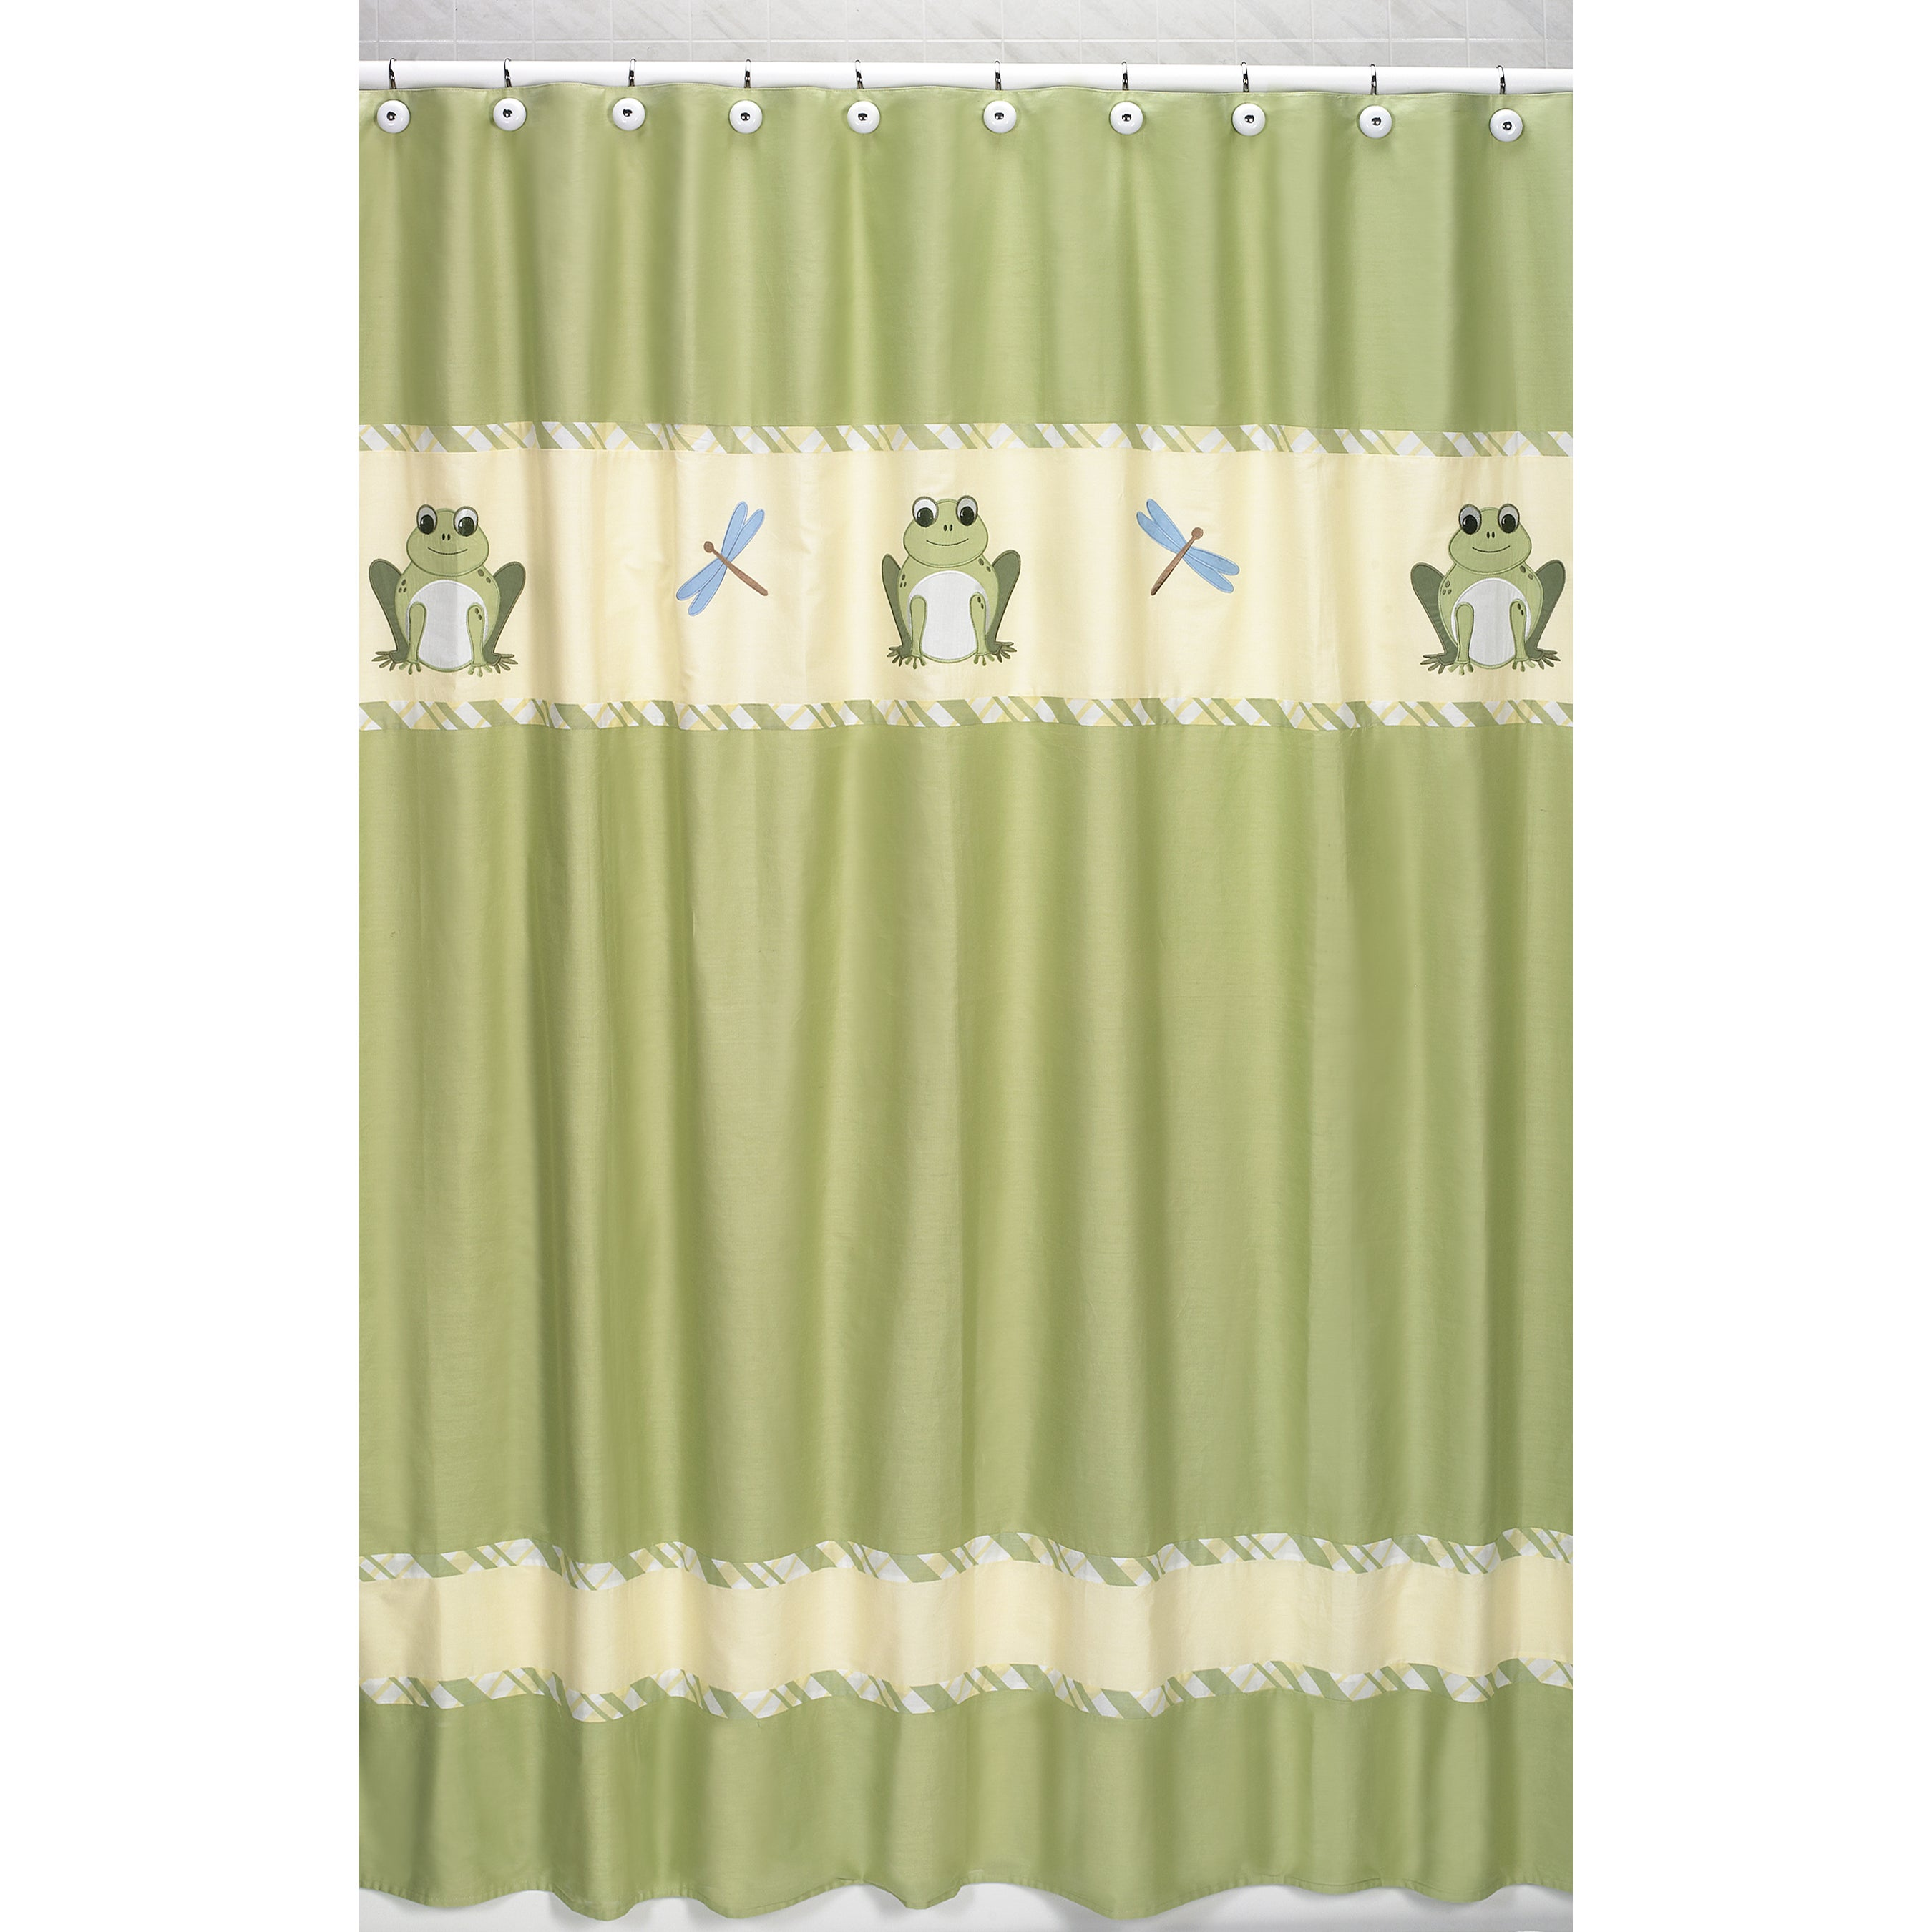 Shower Curtains Leap Frog Kids Shower Curtain SC LeapFrog 7601610 ...